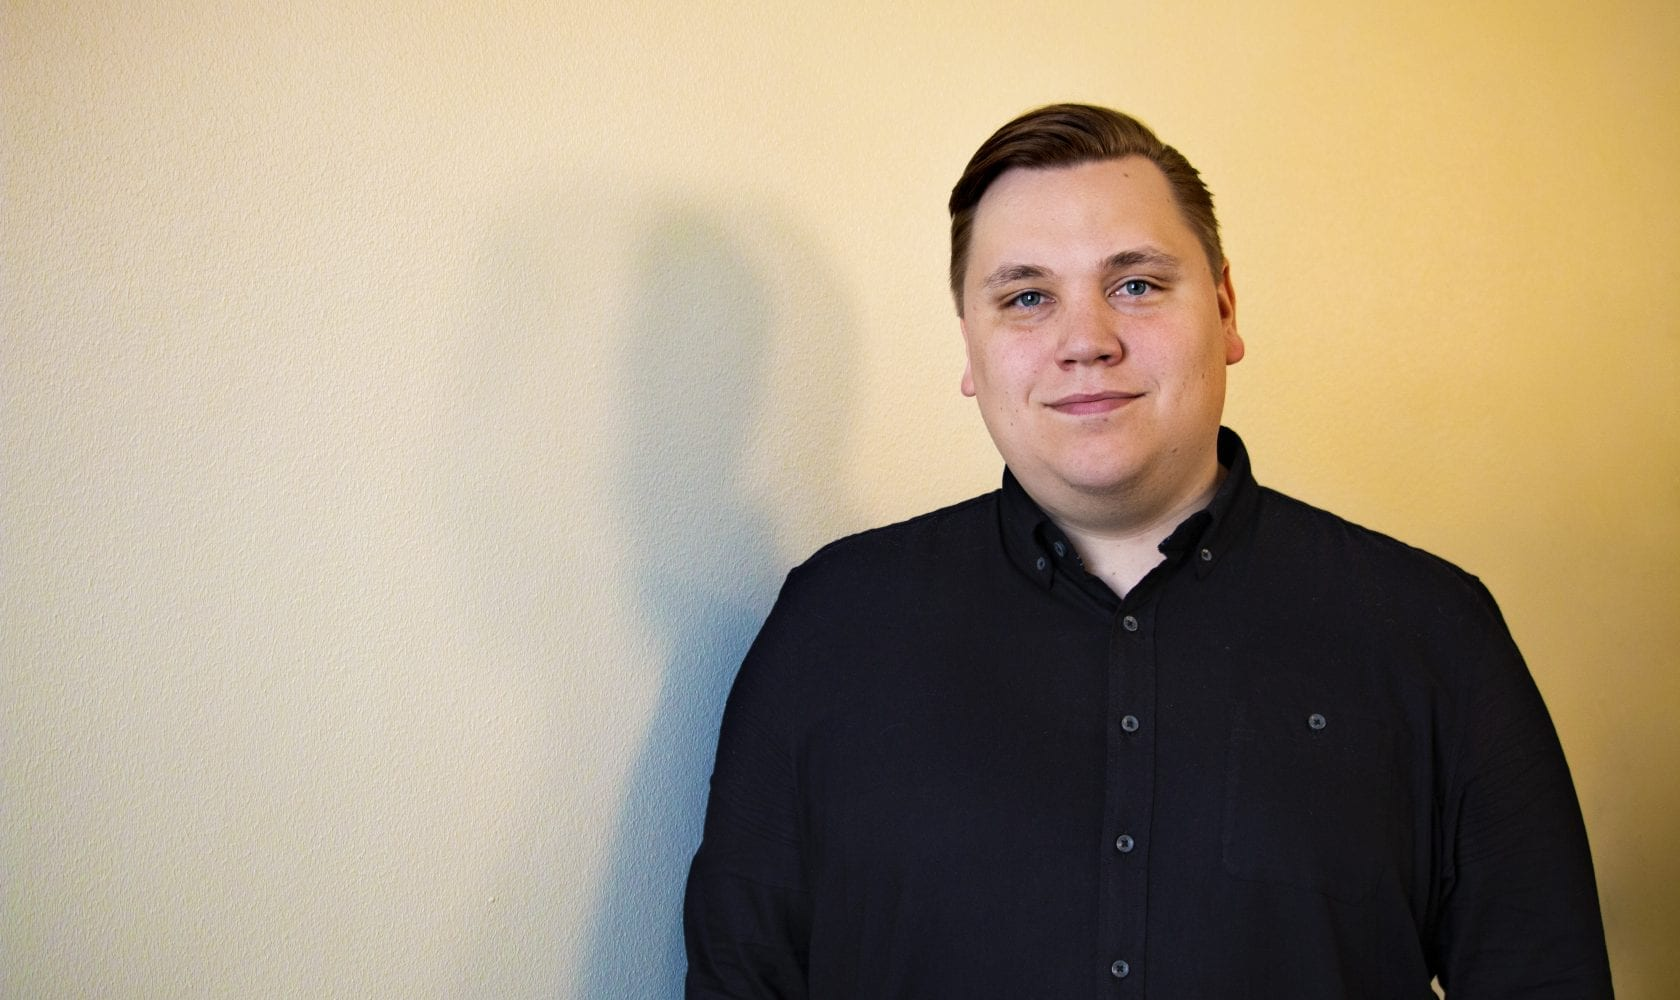 Jari Järvenpää